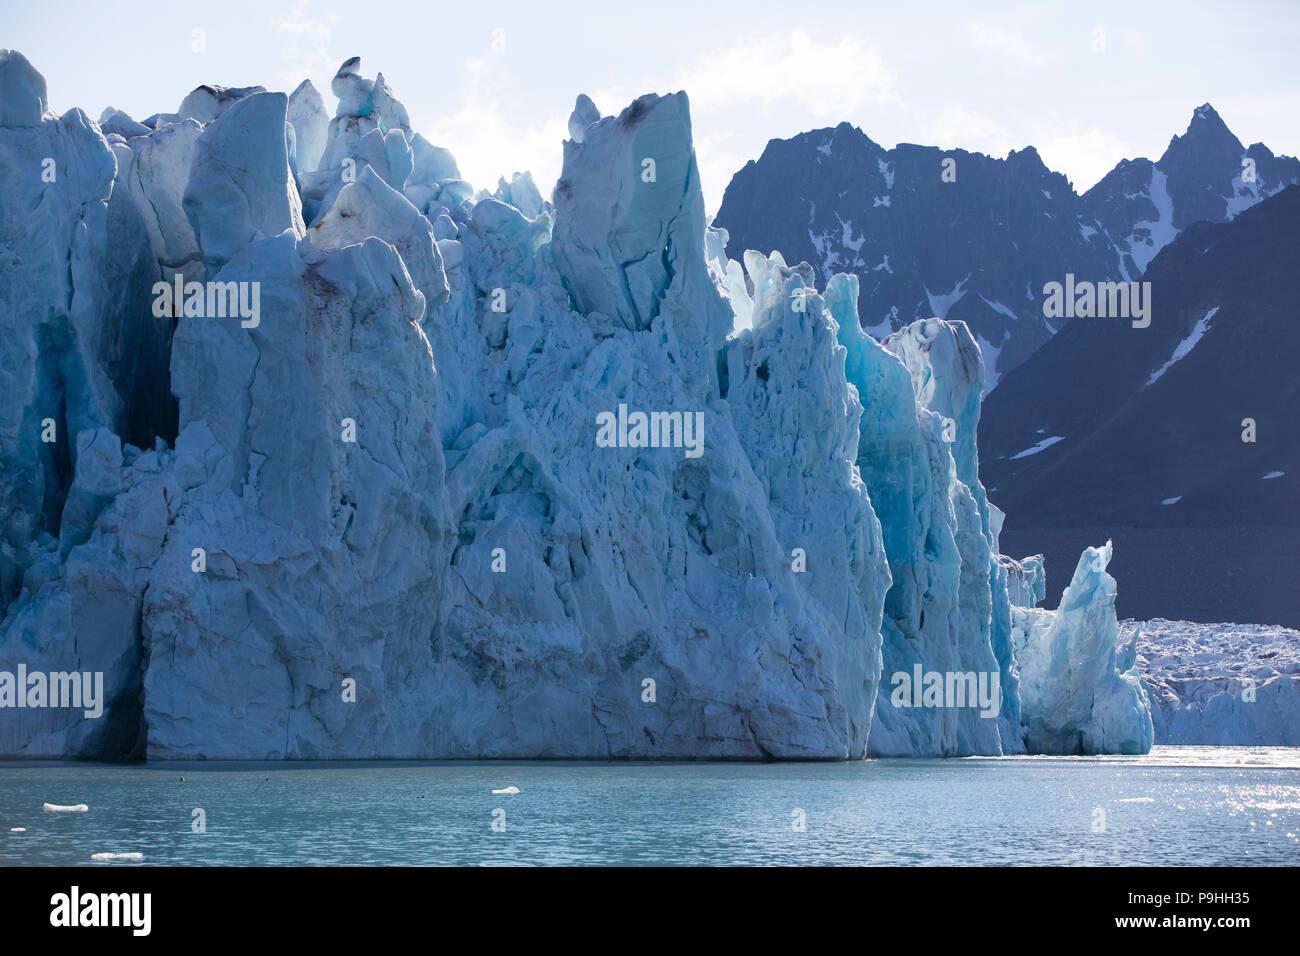 Glacier face, Monacobreen, Svalbard Stock Photo